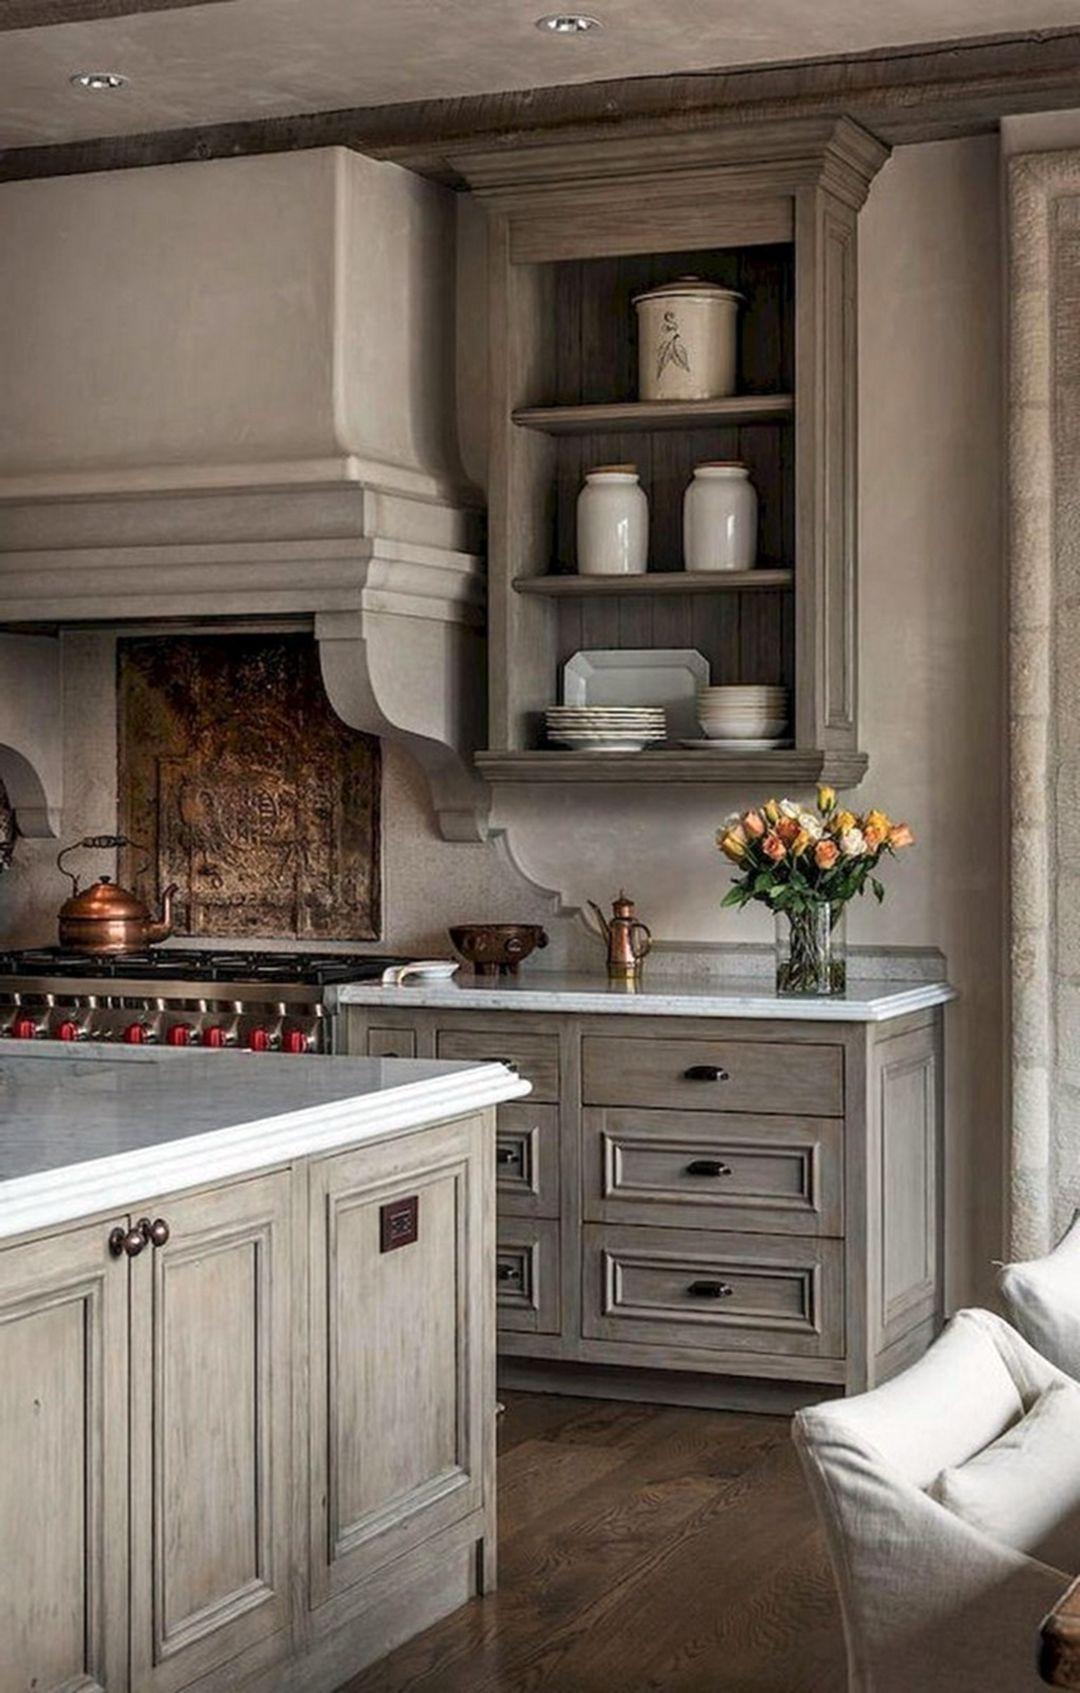 11 Elegant Modern Rustic Farmhouse Kitchen Cabinets Ideas Country Style Kitchen Modern Farmhouse Kitchens Farmhouse Style Kitchen